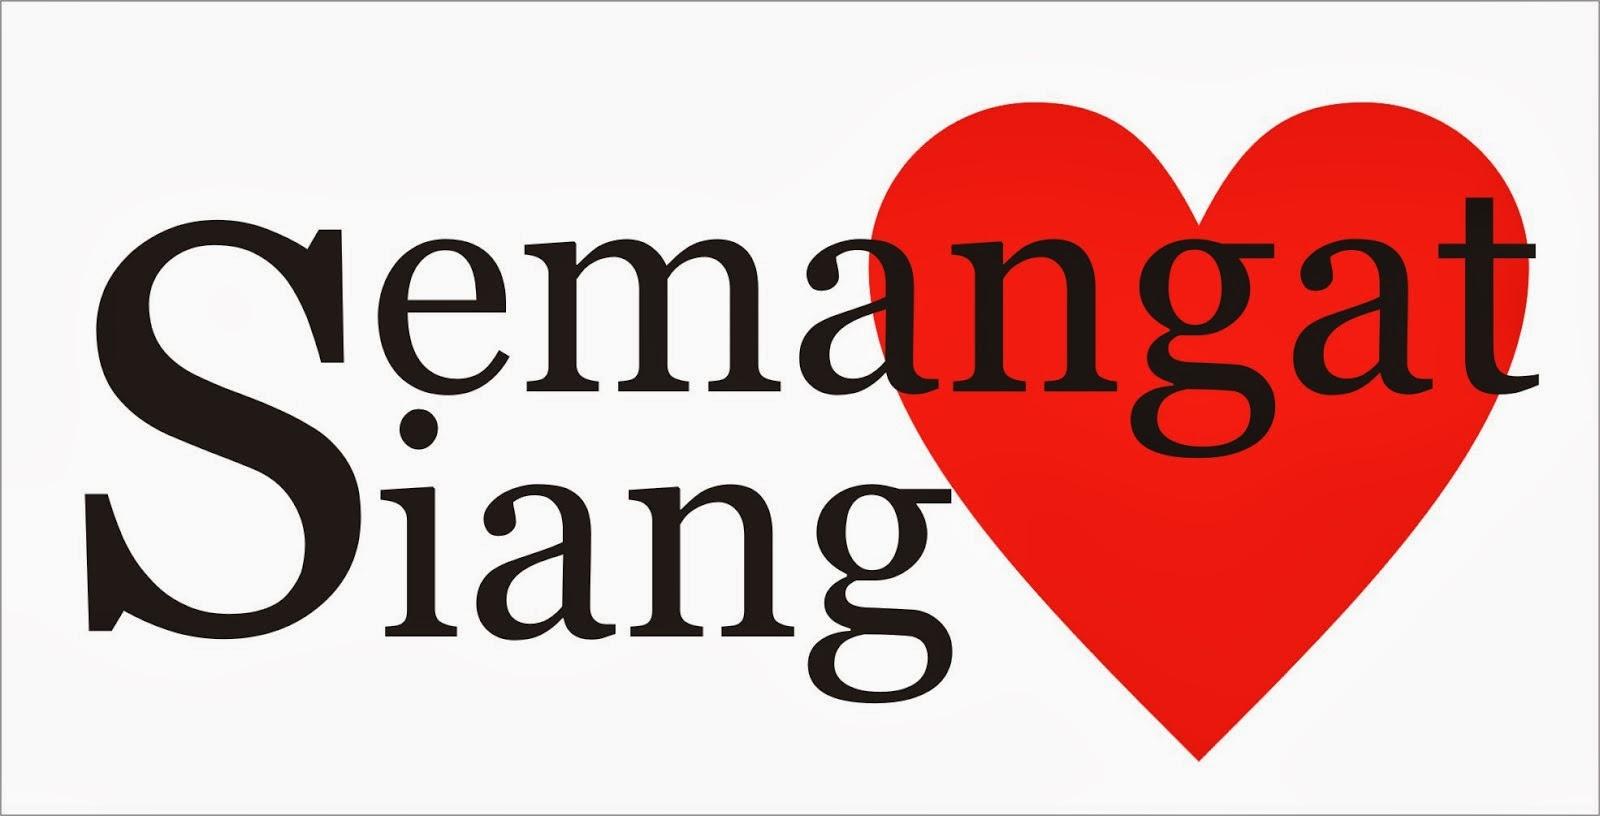 Kata Kata Lucu Romantis Buat Pacar DP BBM Lucu Untuk Hari Ini